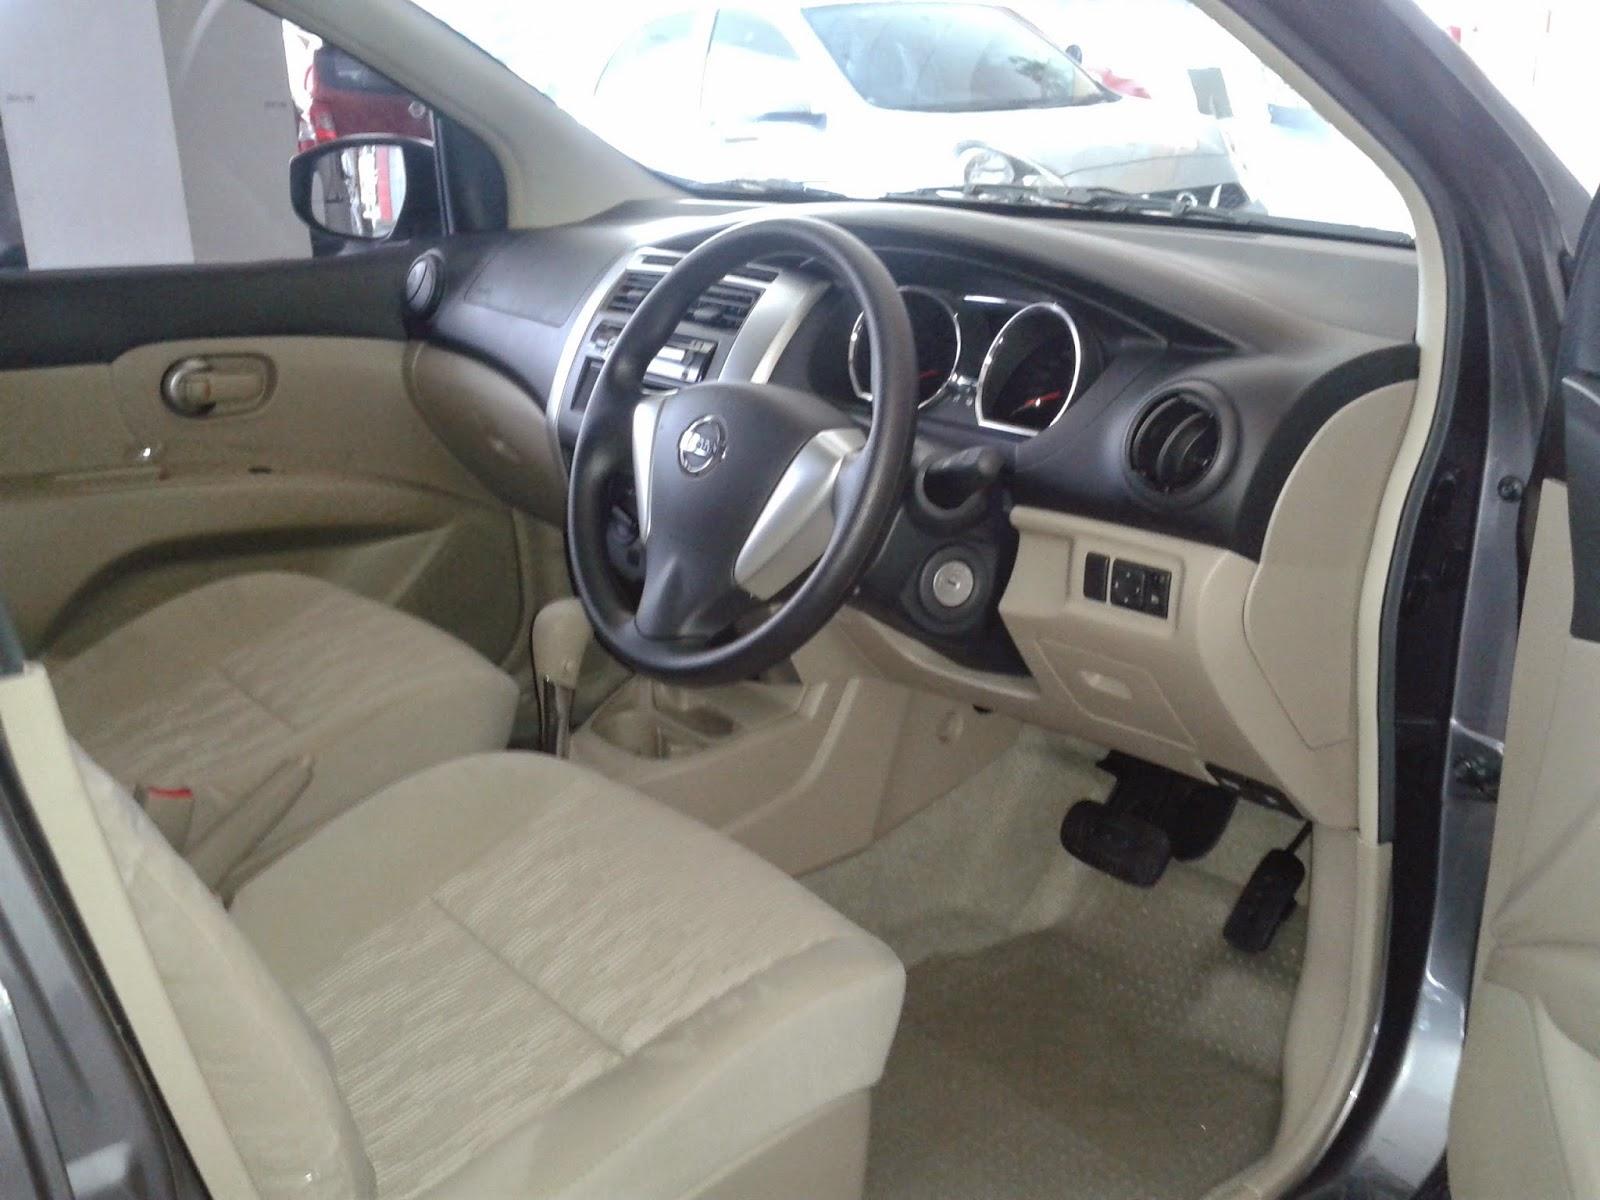 Harga Grand New Veloz 1.5 2017 All Kijang Innova 2.0 G A/t Lux Nissan Livina Promo Mobil Datsun Go Kredit